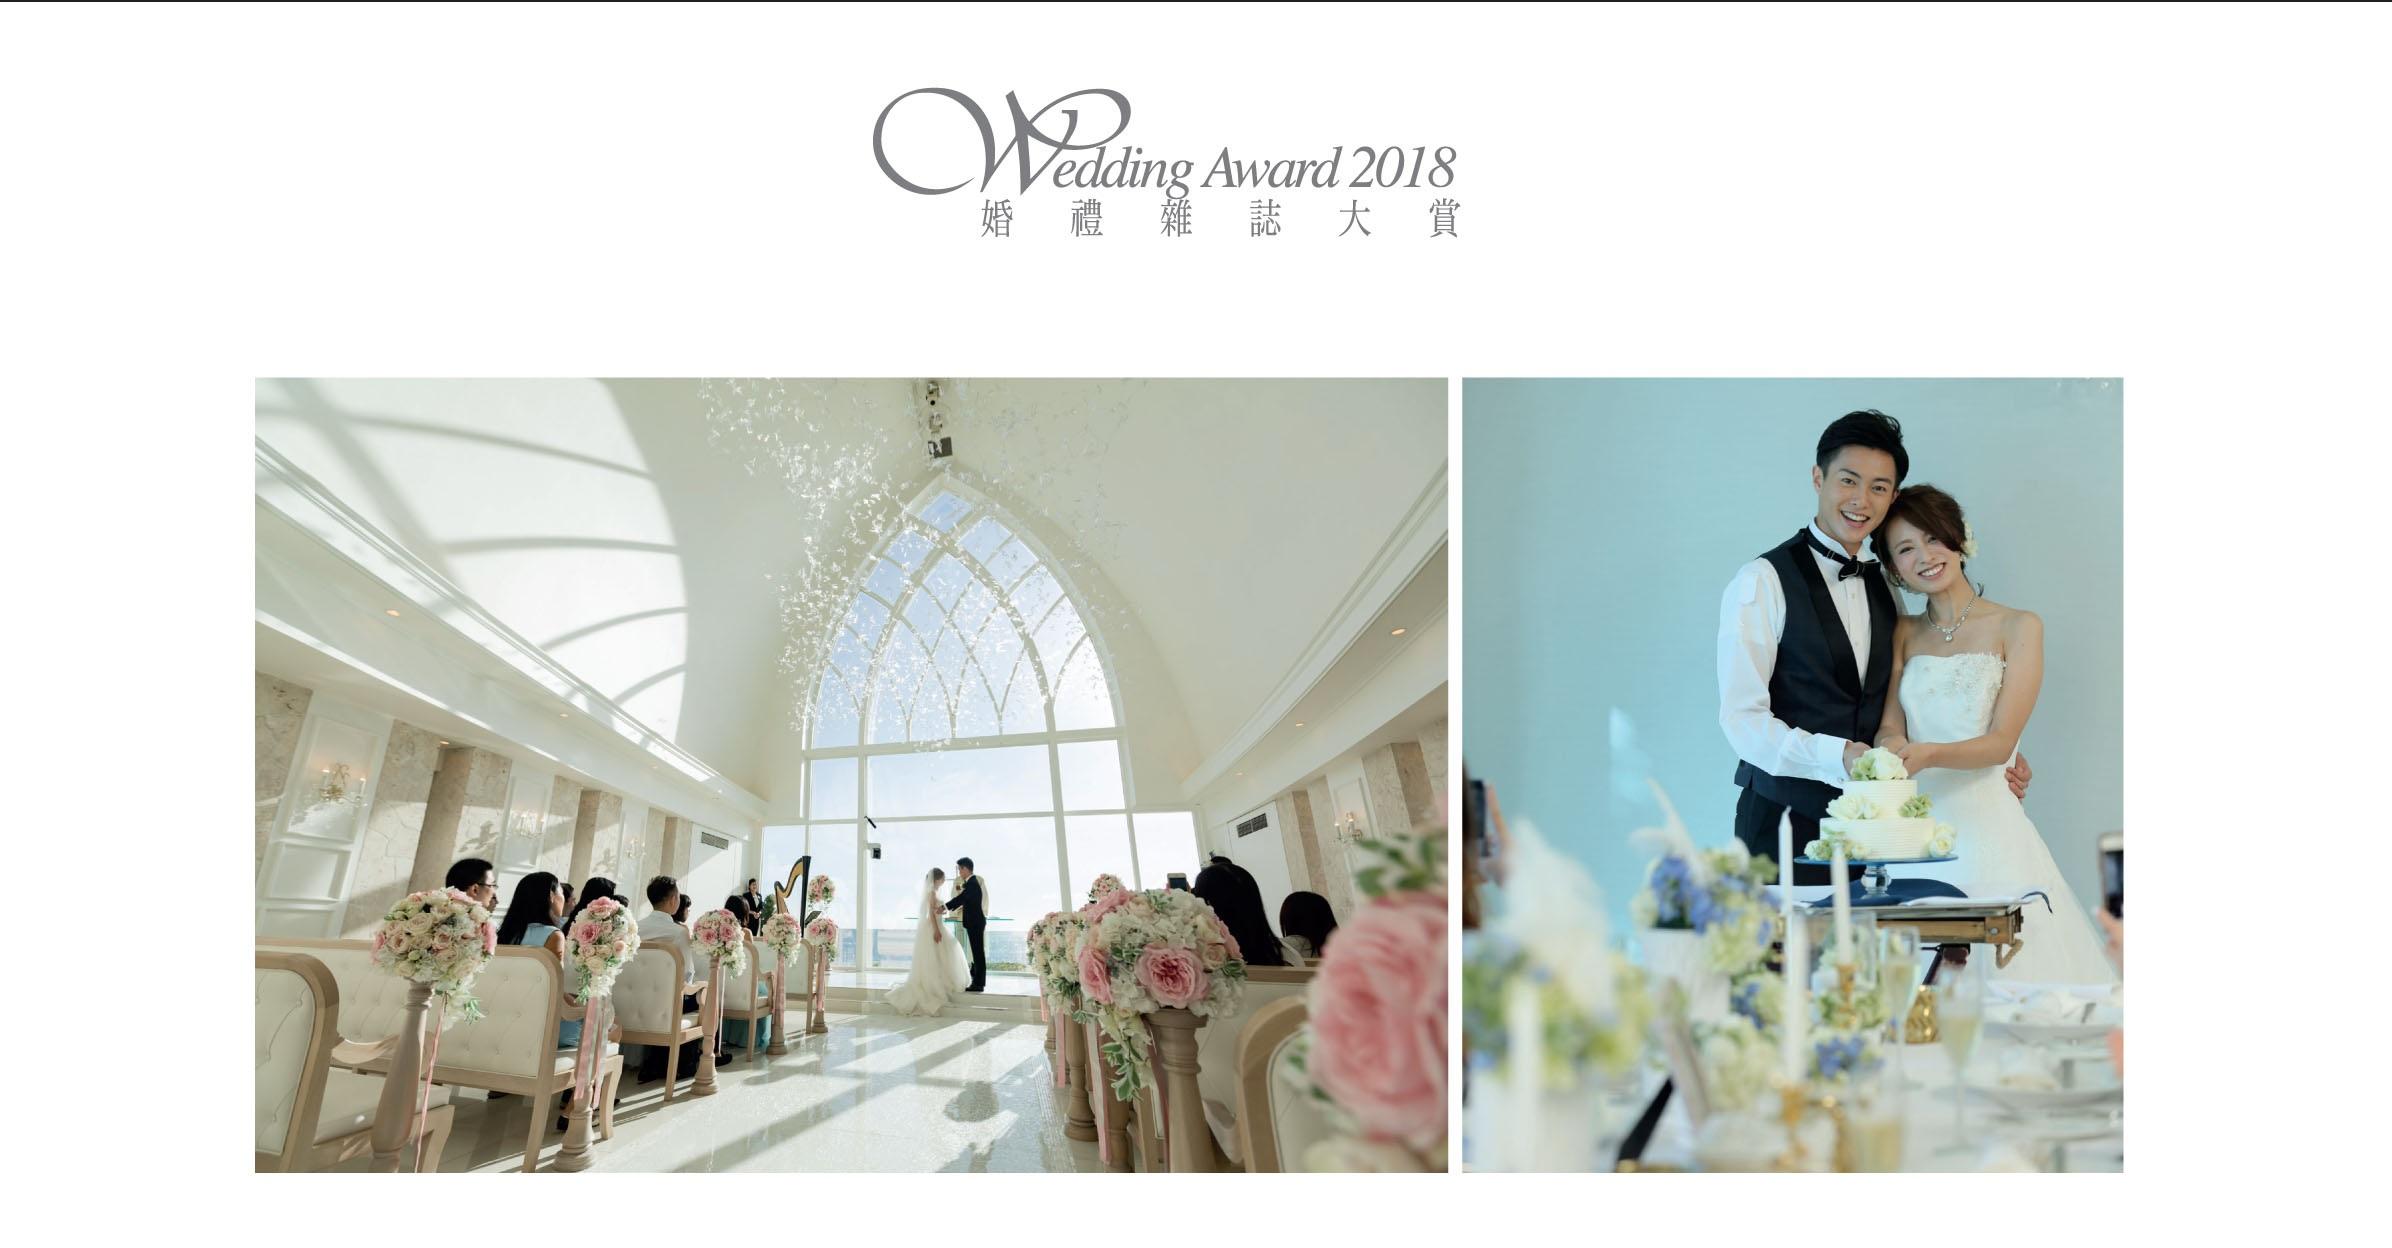 Watabe Wedding 榮獲2018 Wedding Award 星級海外婚禮最佳場地